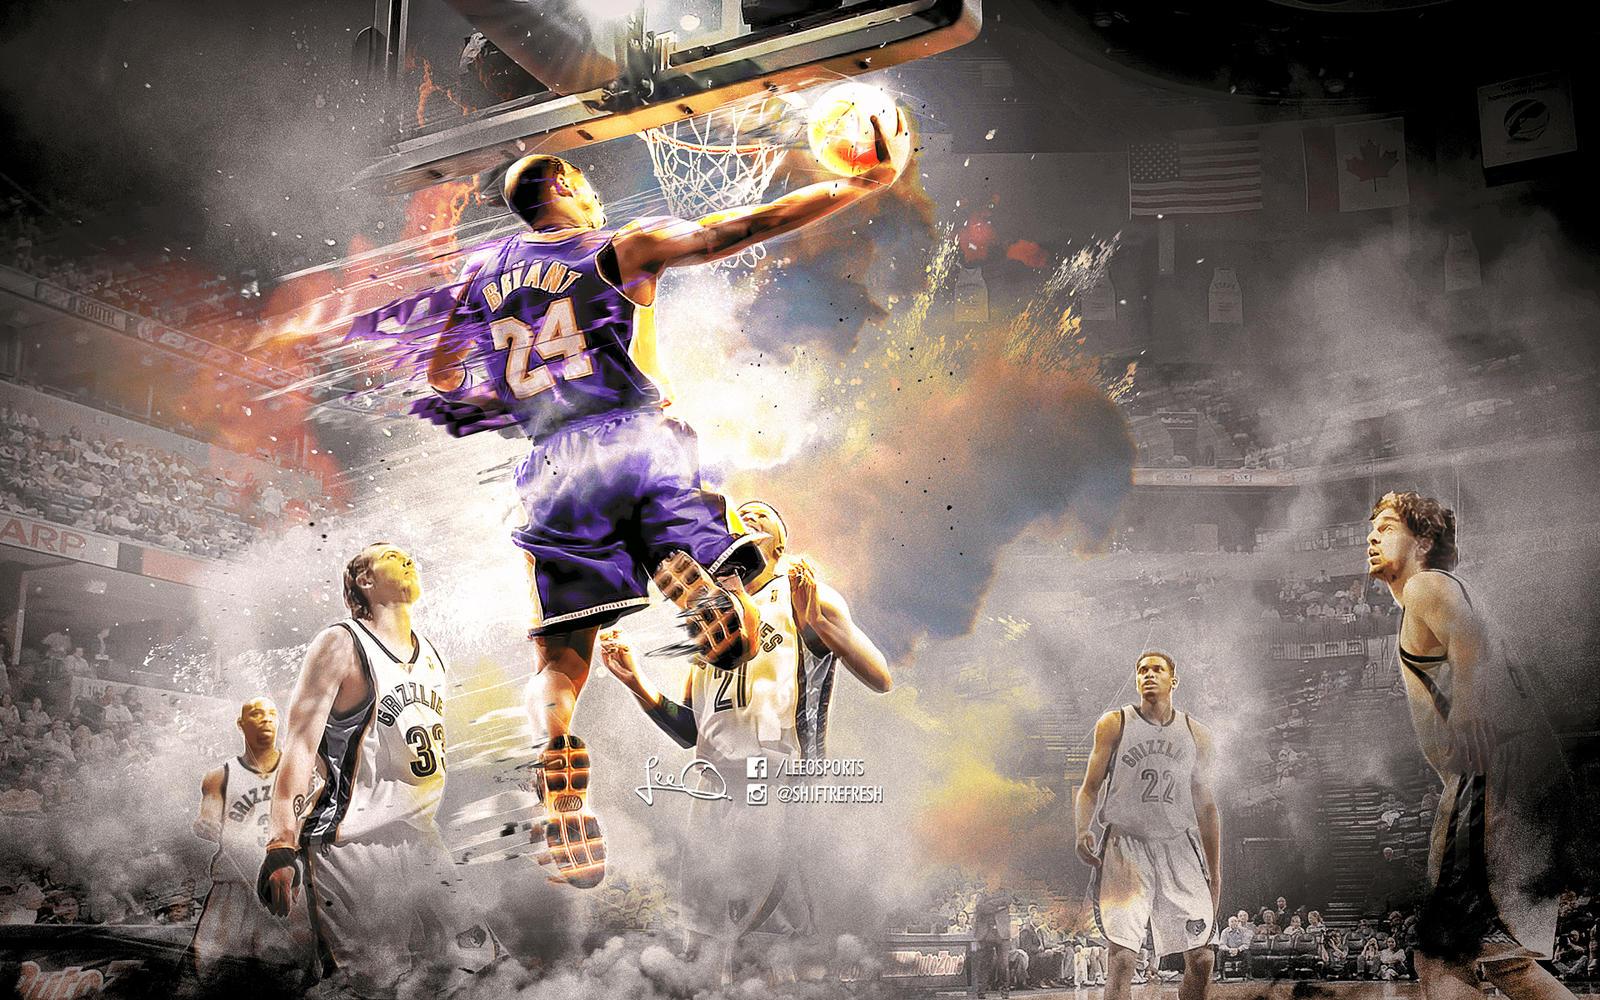 Nba Kobe Bryant Wallpaper